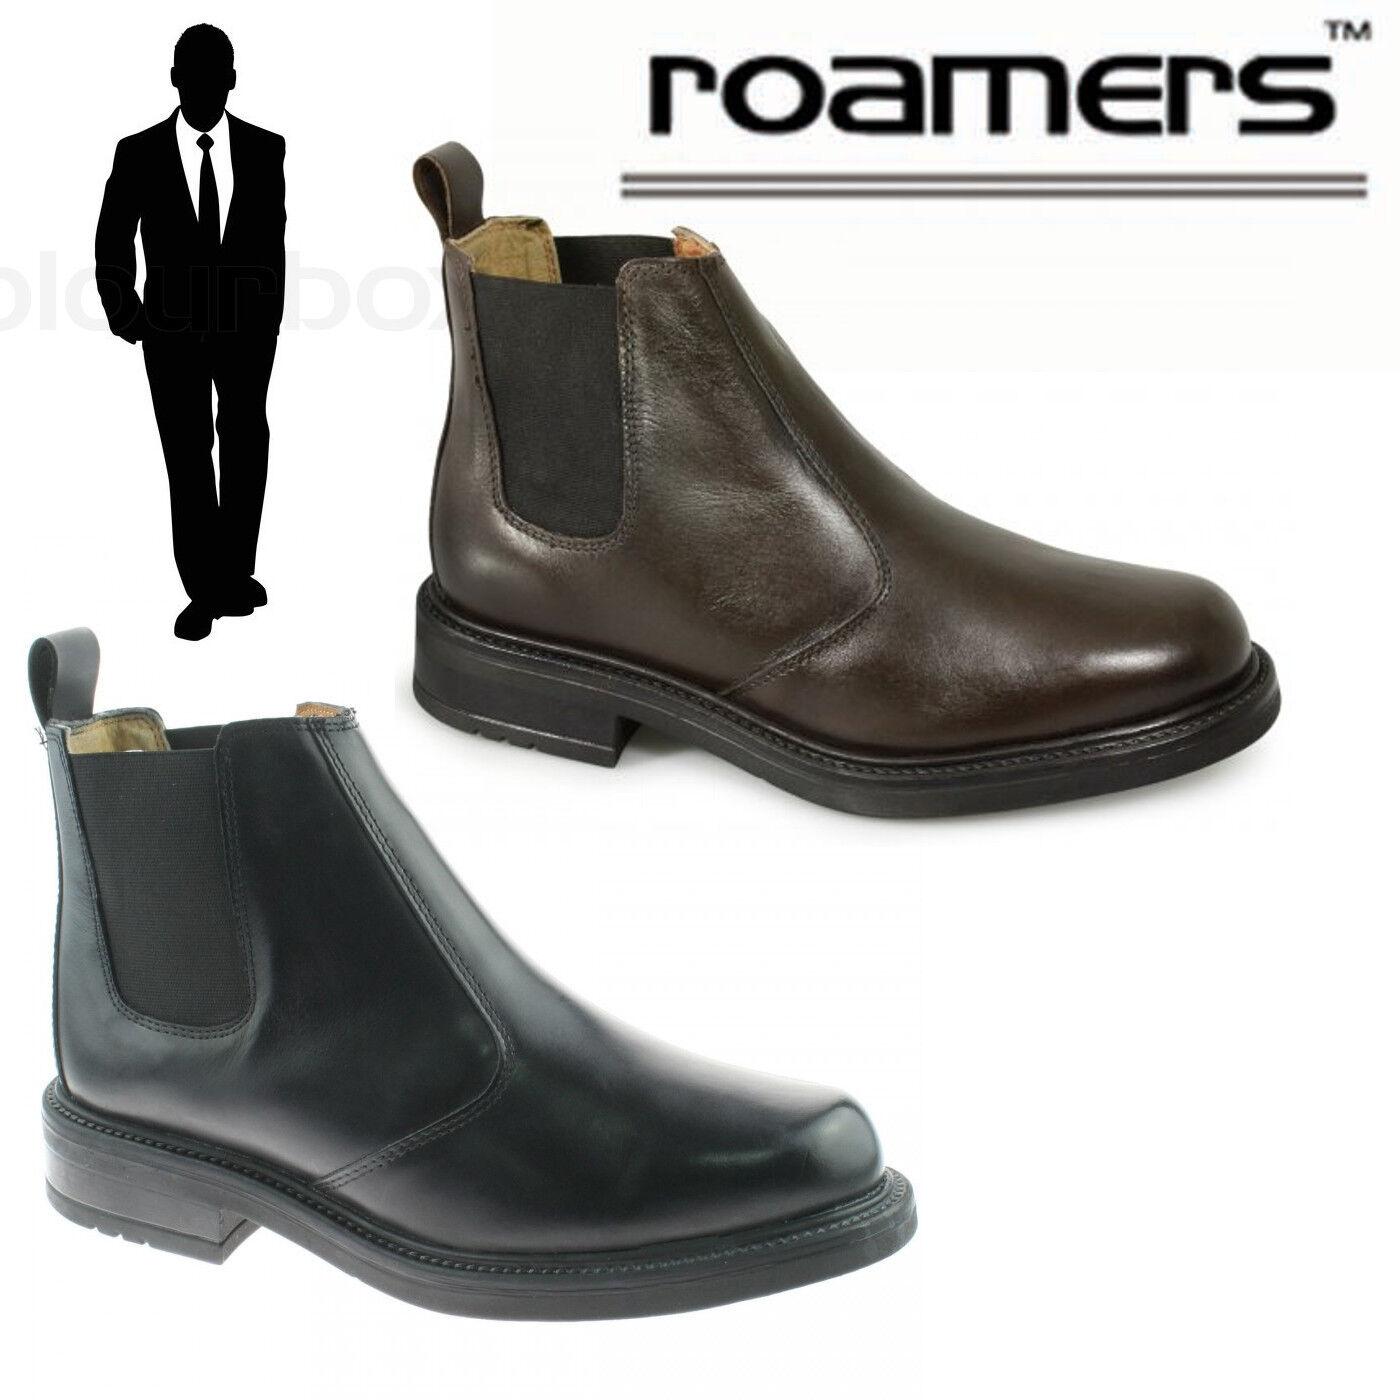 Roamers Hombre Chelsea Smart botas Twin Gusset Negro Marrón Leather Smart Chelsea Casual Zapatos eb0d89